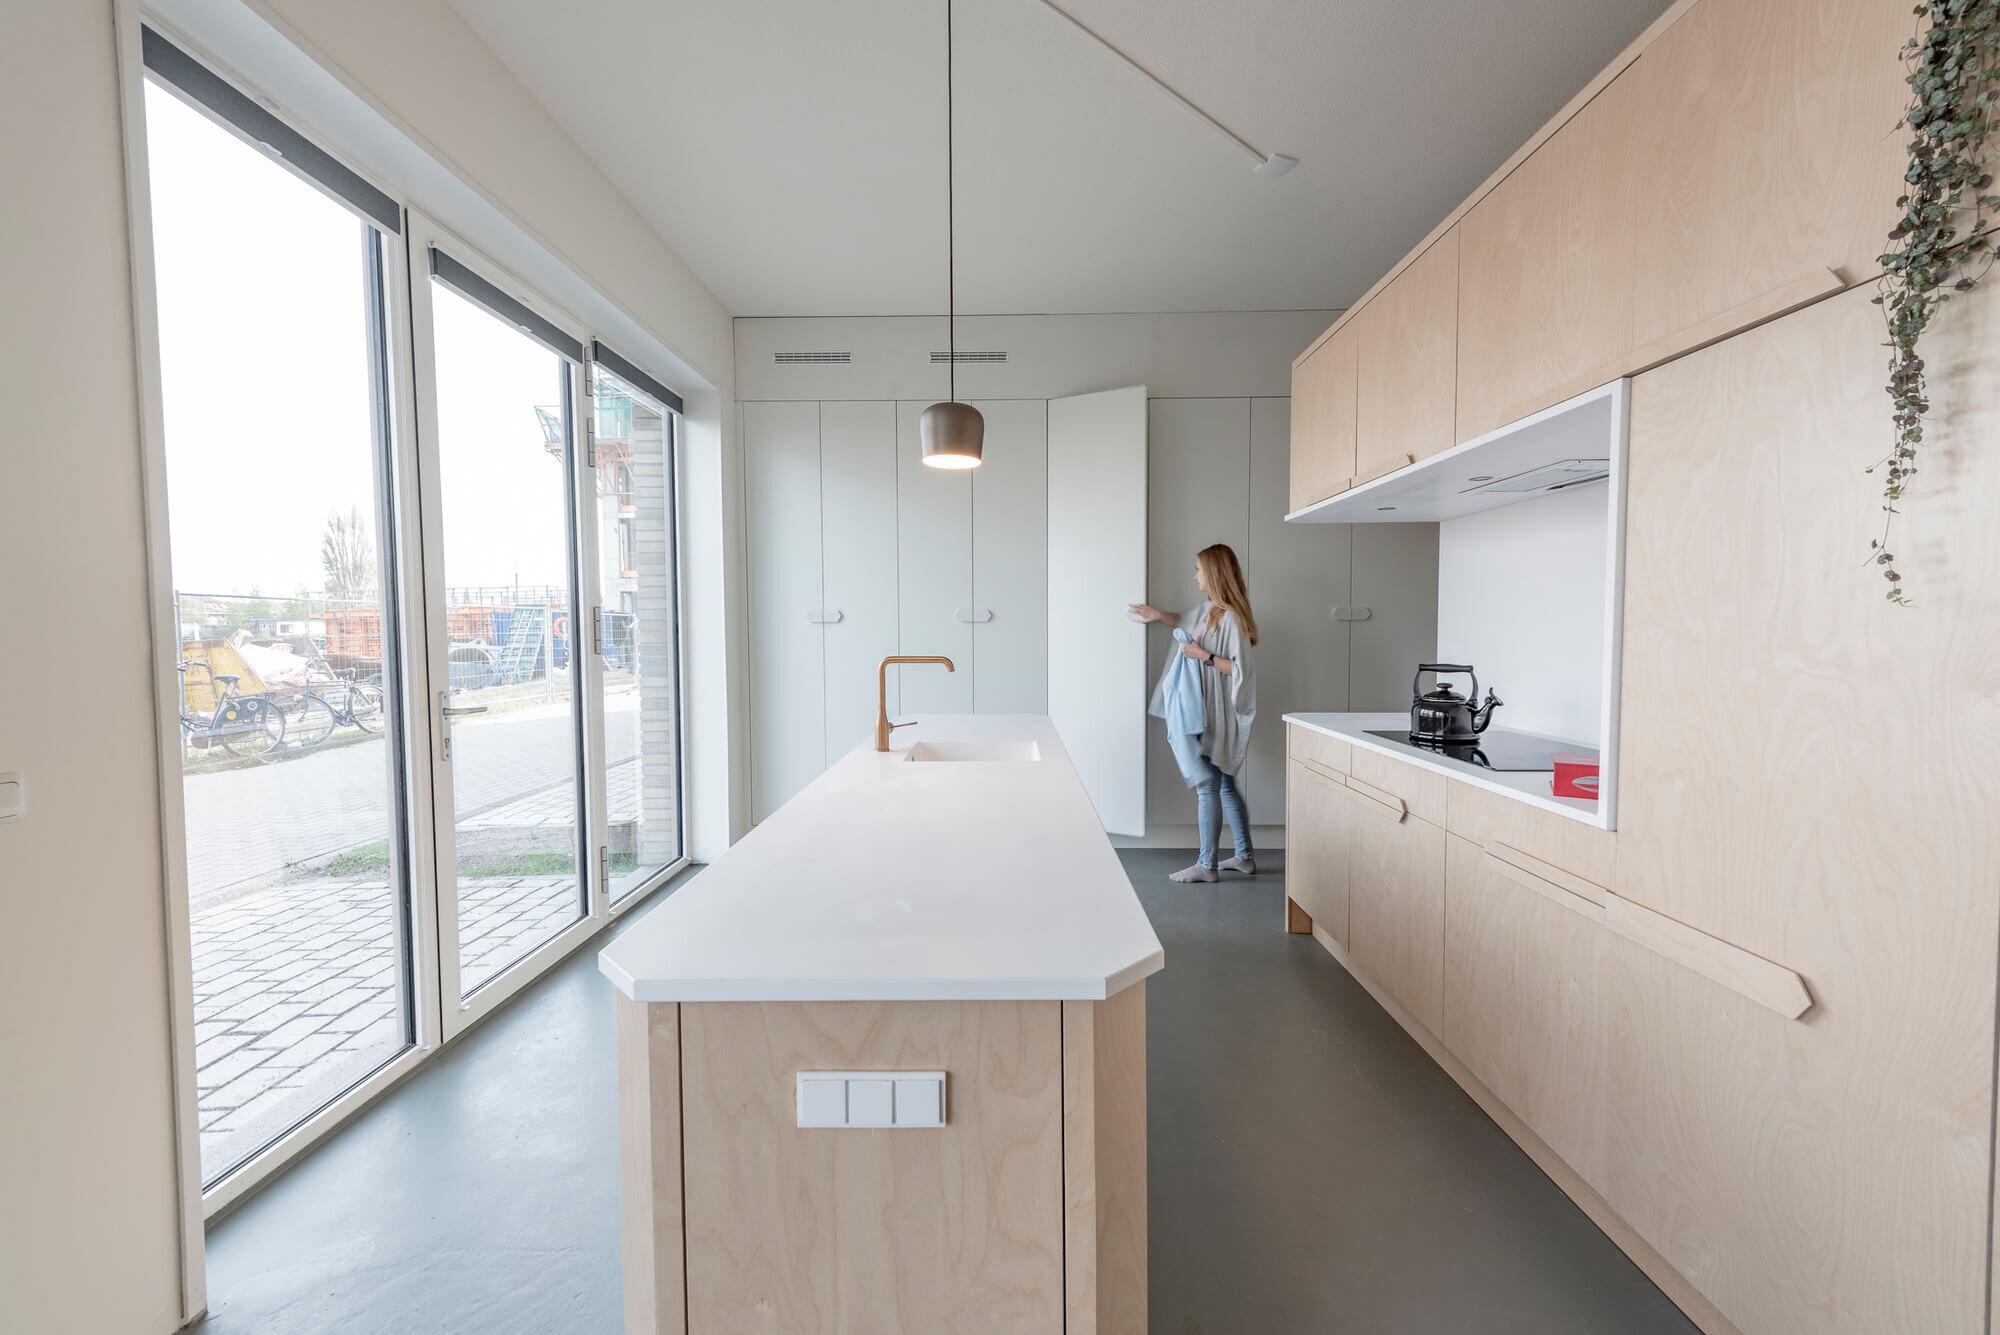 Loft-Buiksloterham-Heren-5-Architects-The-Netherlands-3